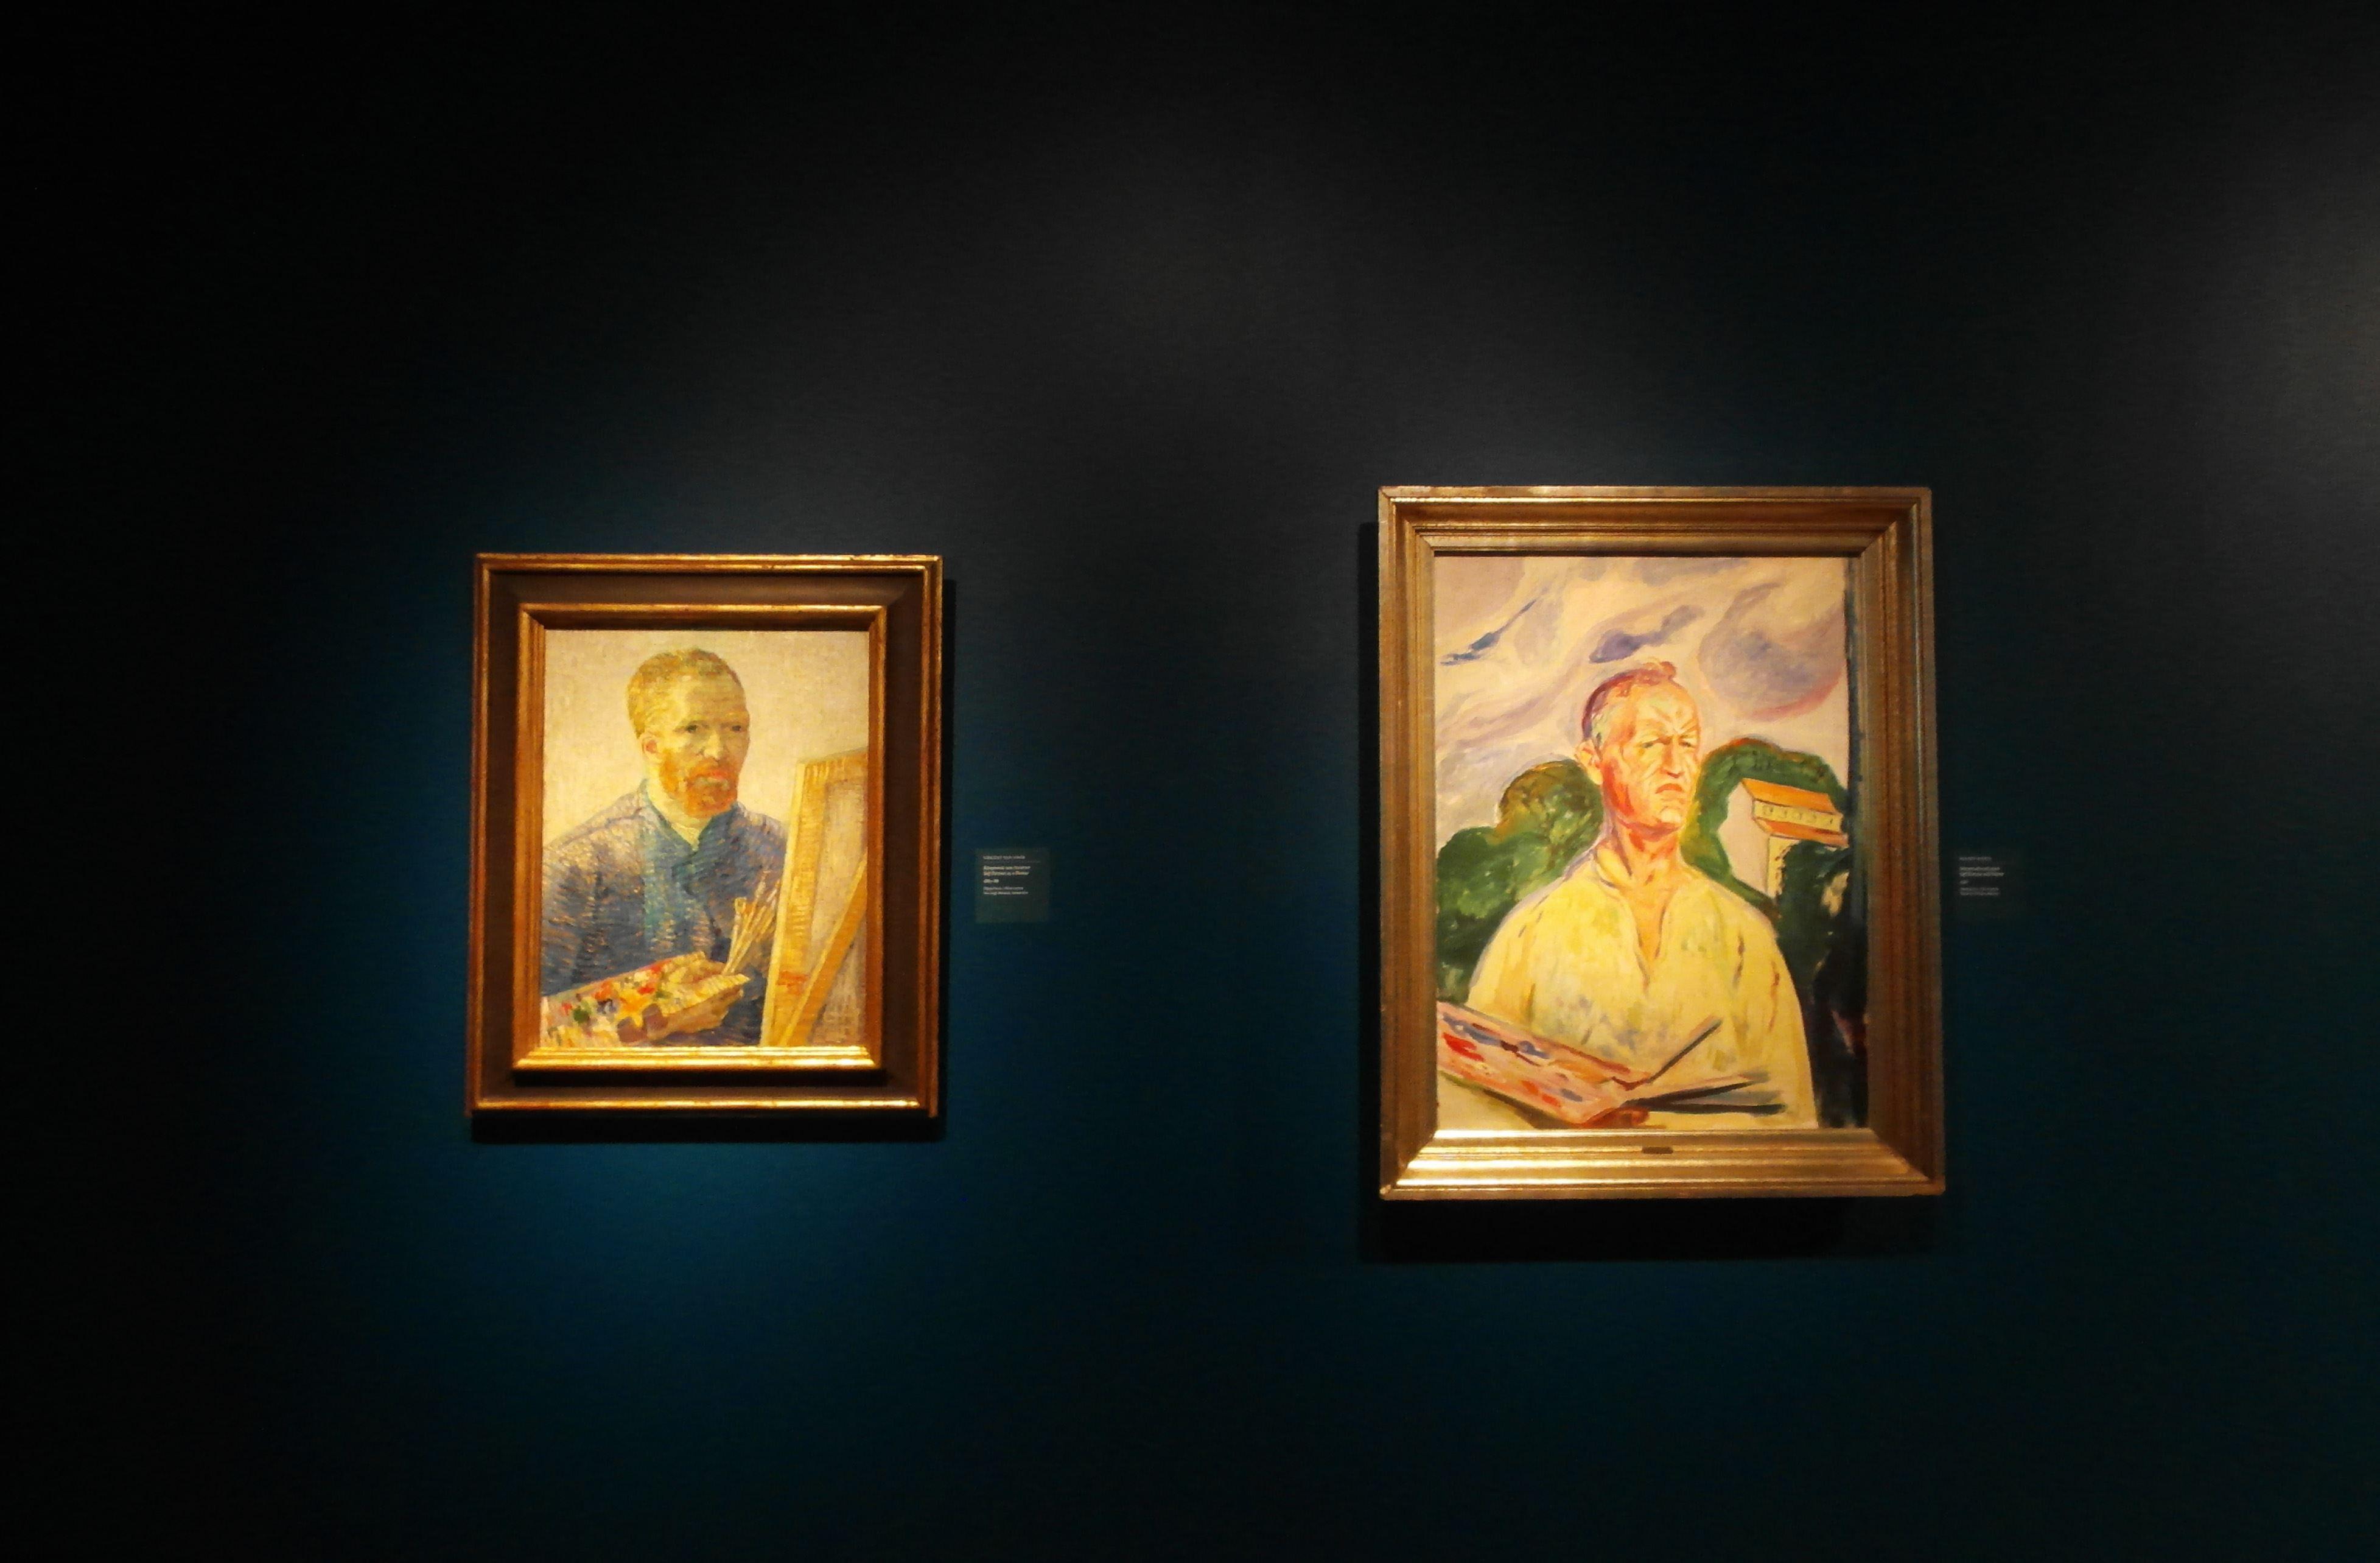 Oslo Van Gogh - Munch (10.15 am - 1.15 pm)